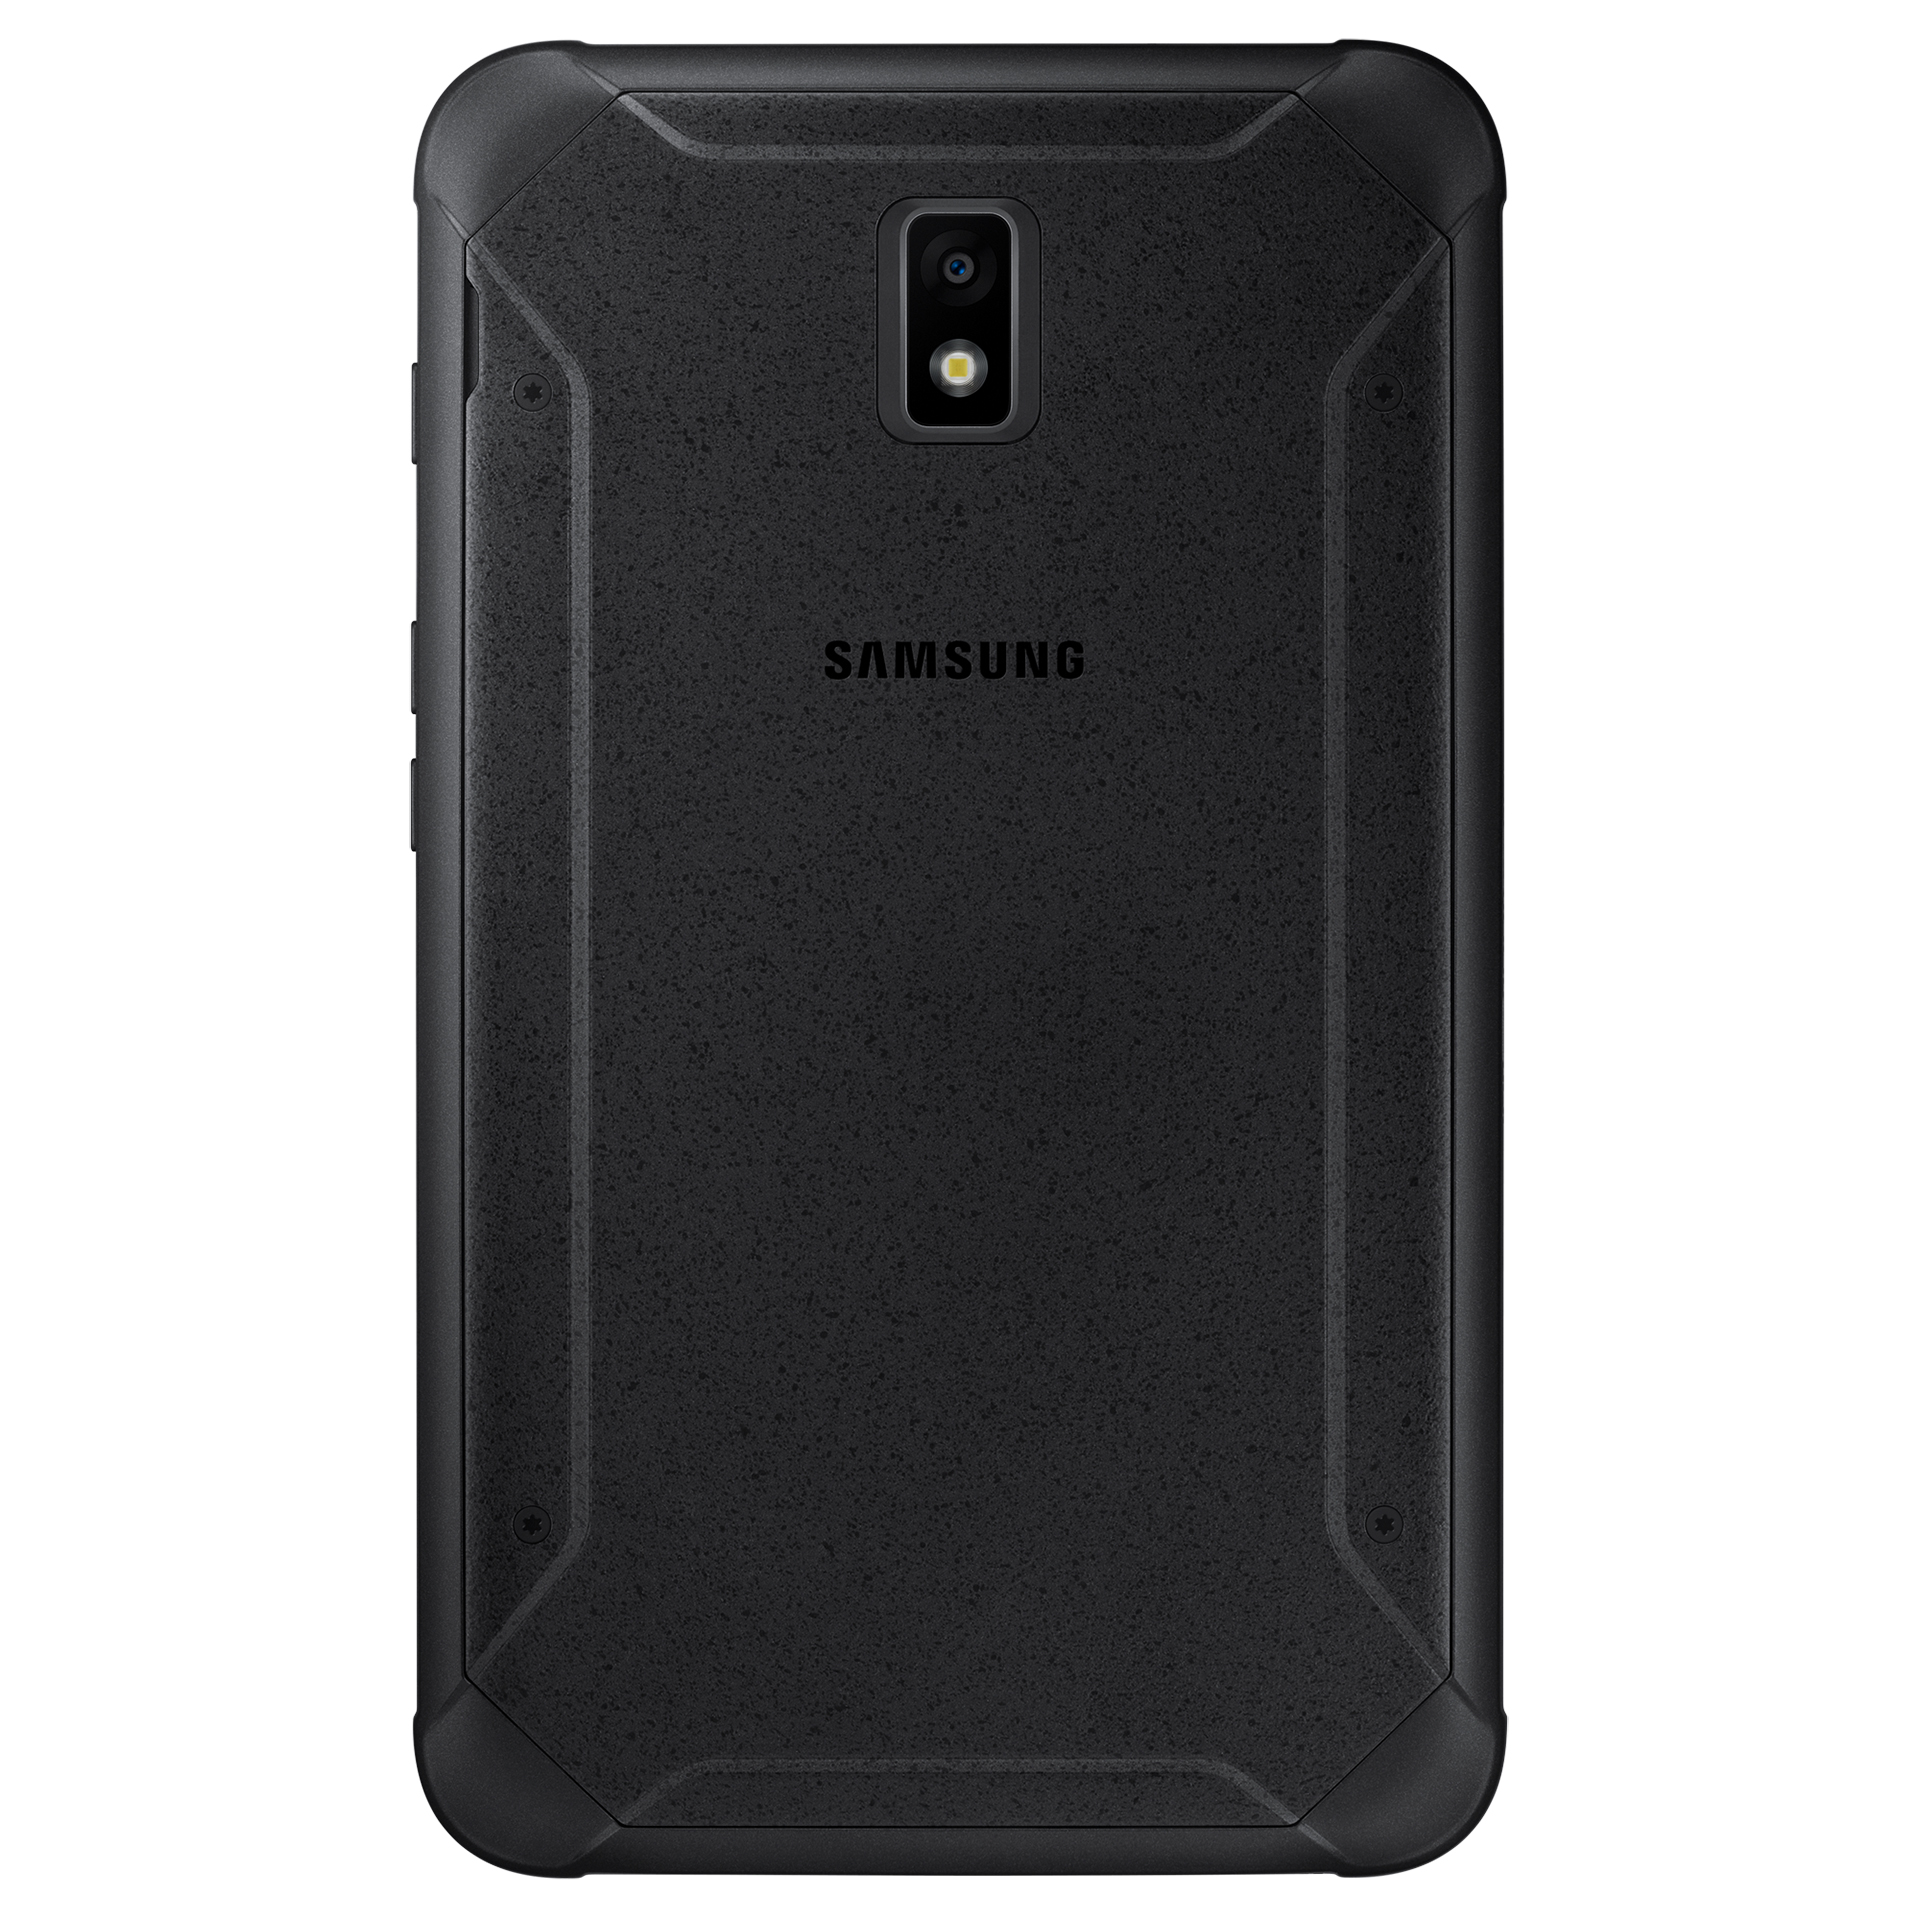 tahvelarvuti Samsung Galaxy Tab Active 2 4G